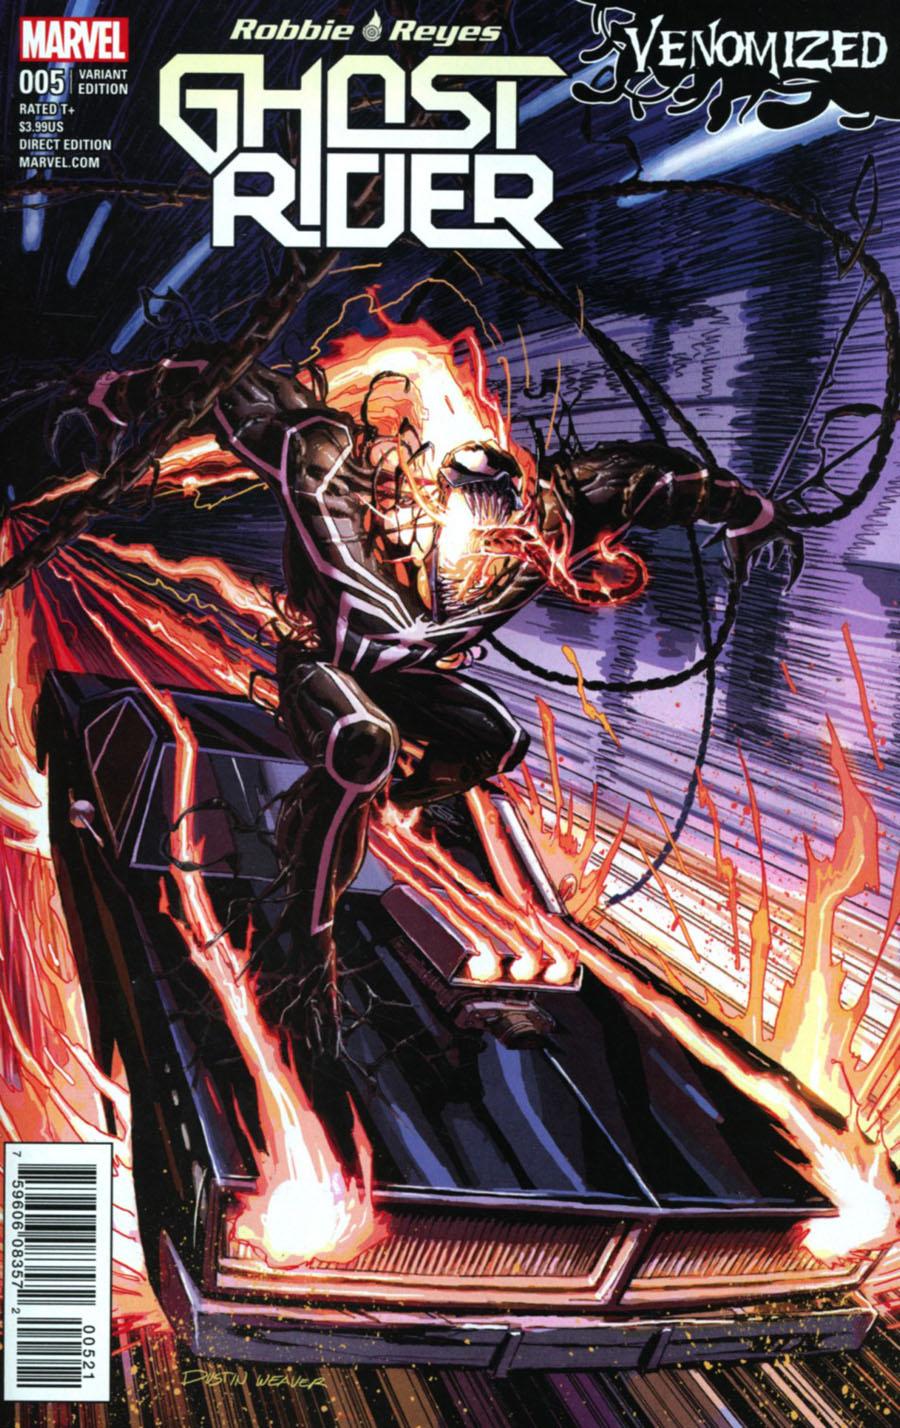 Ghost Rider Vol 7 #5 Cover B Variant Dustin Weaver Venomized Cover